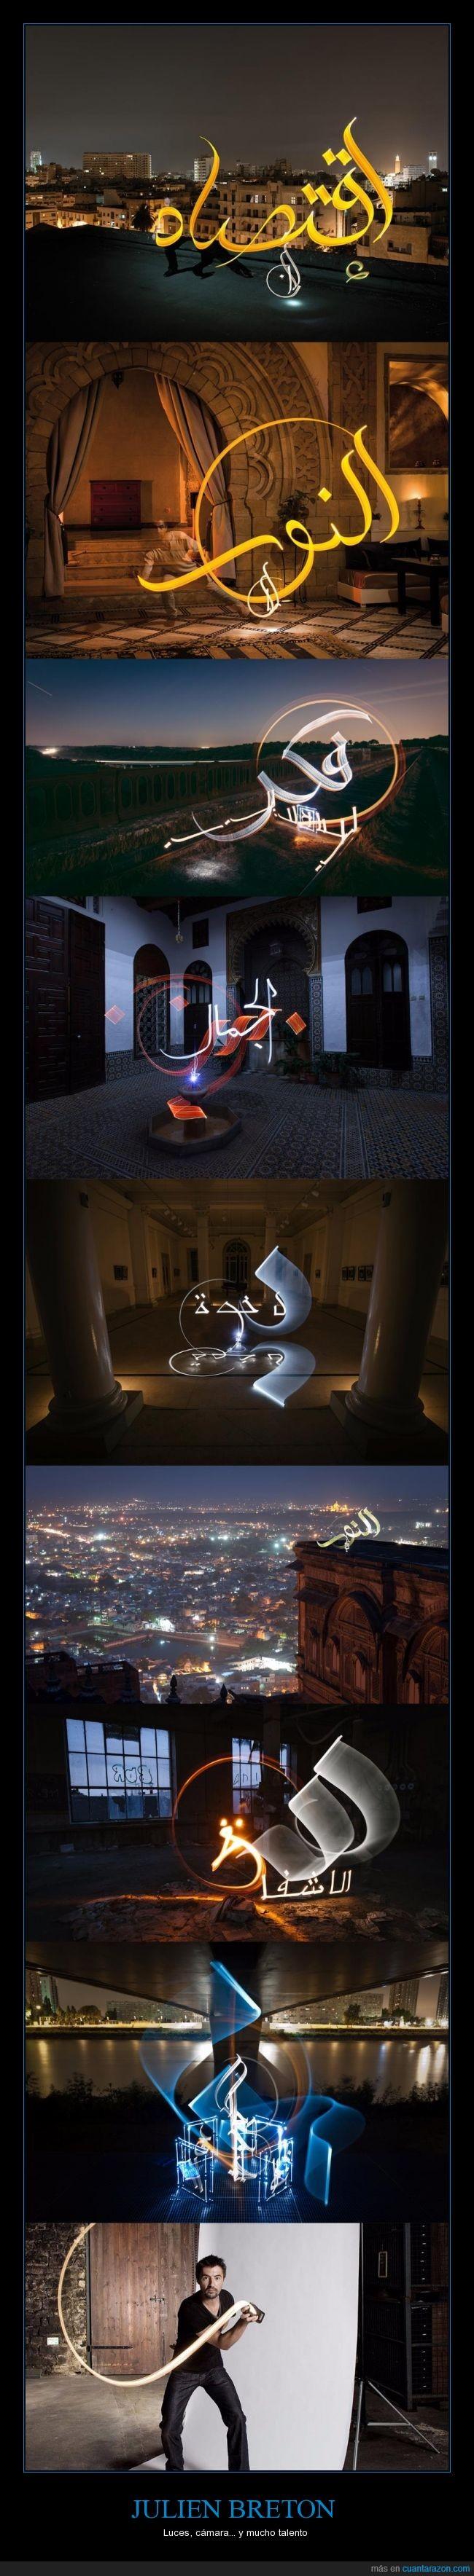 camara,china,dibujos en el aire,iso,Julien Breton,larga exposición,letras,luces,luz